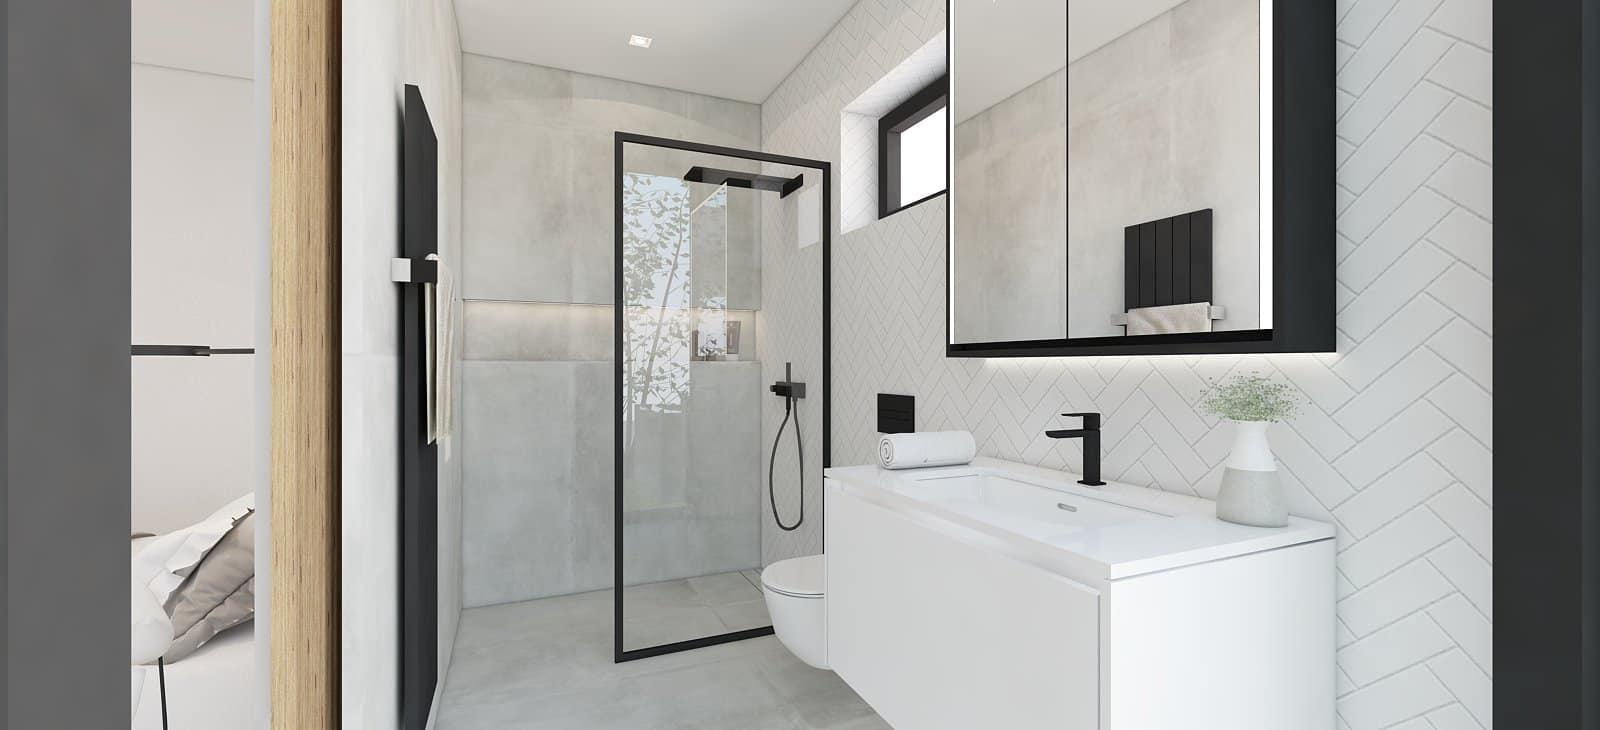 kúpelňa interiér